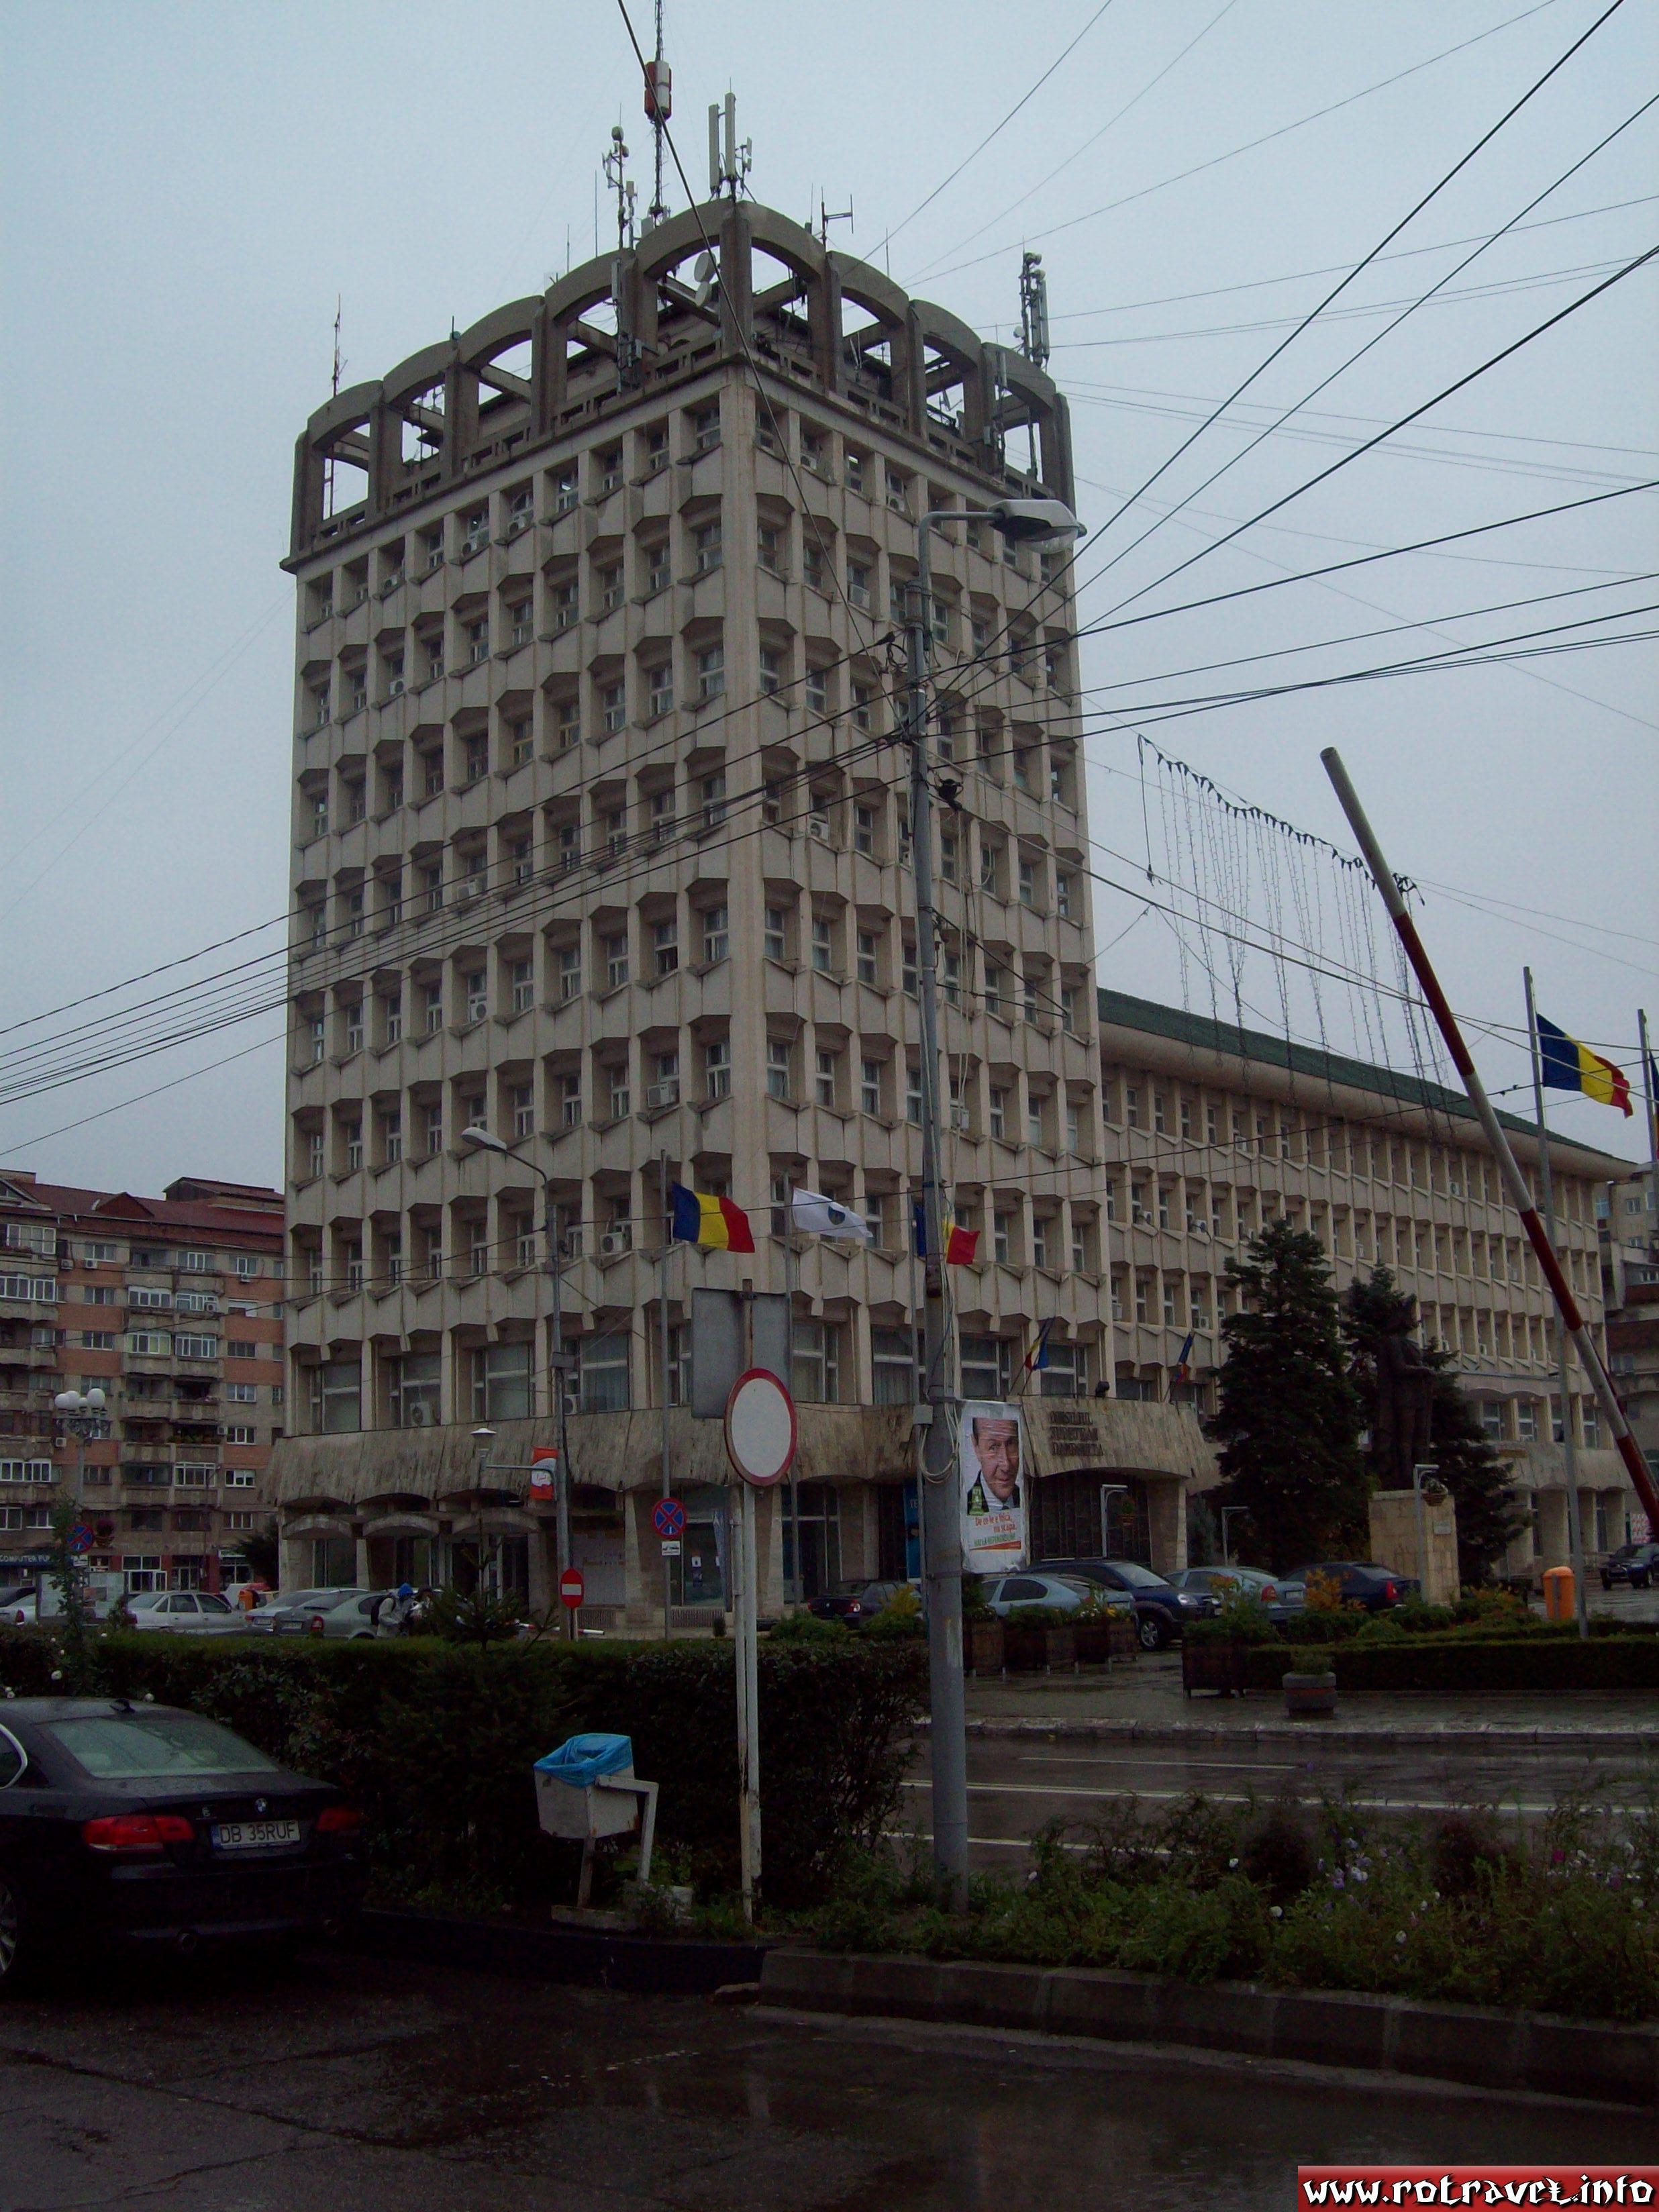 Consiliul Judeţean Dâmboviţa (Dambovita County Council)